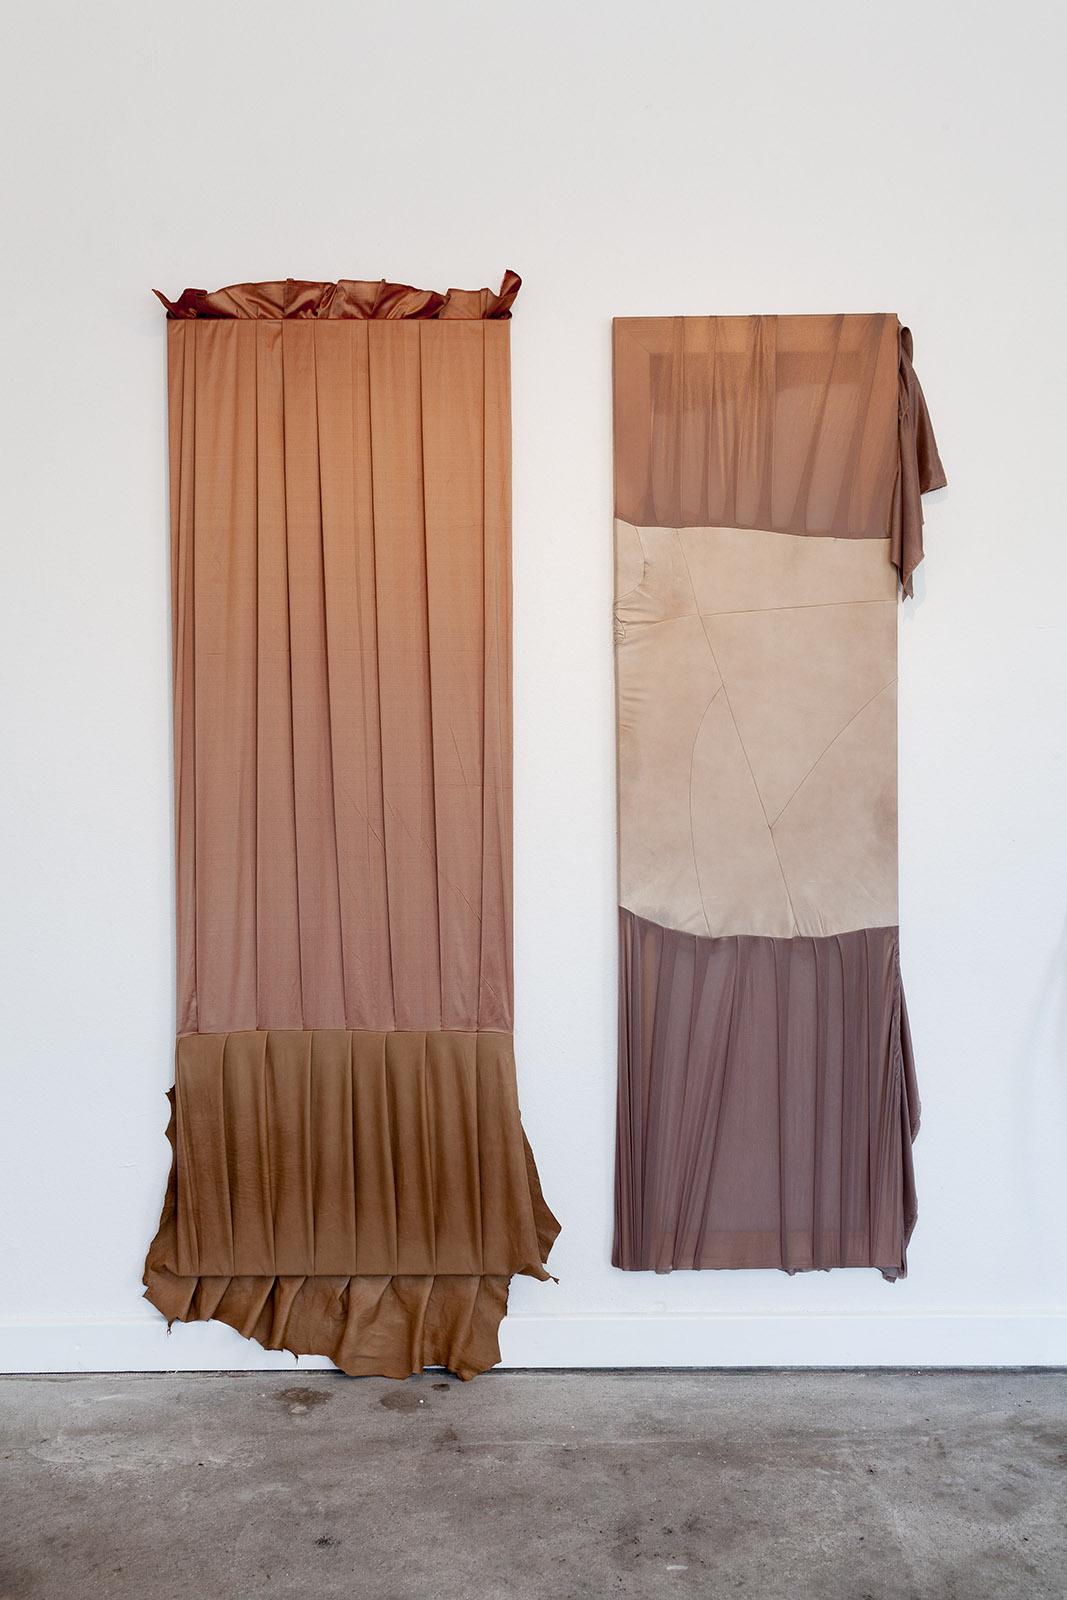 Louise Sparre, Objects Condition. SE. Foto: Morten Barker.